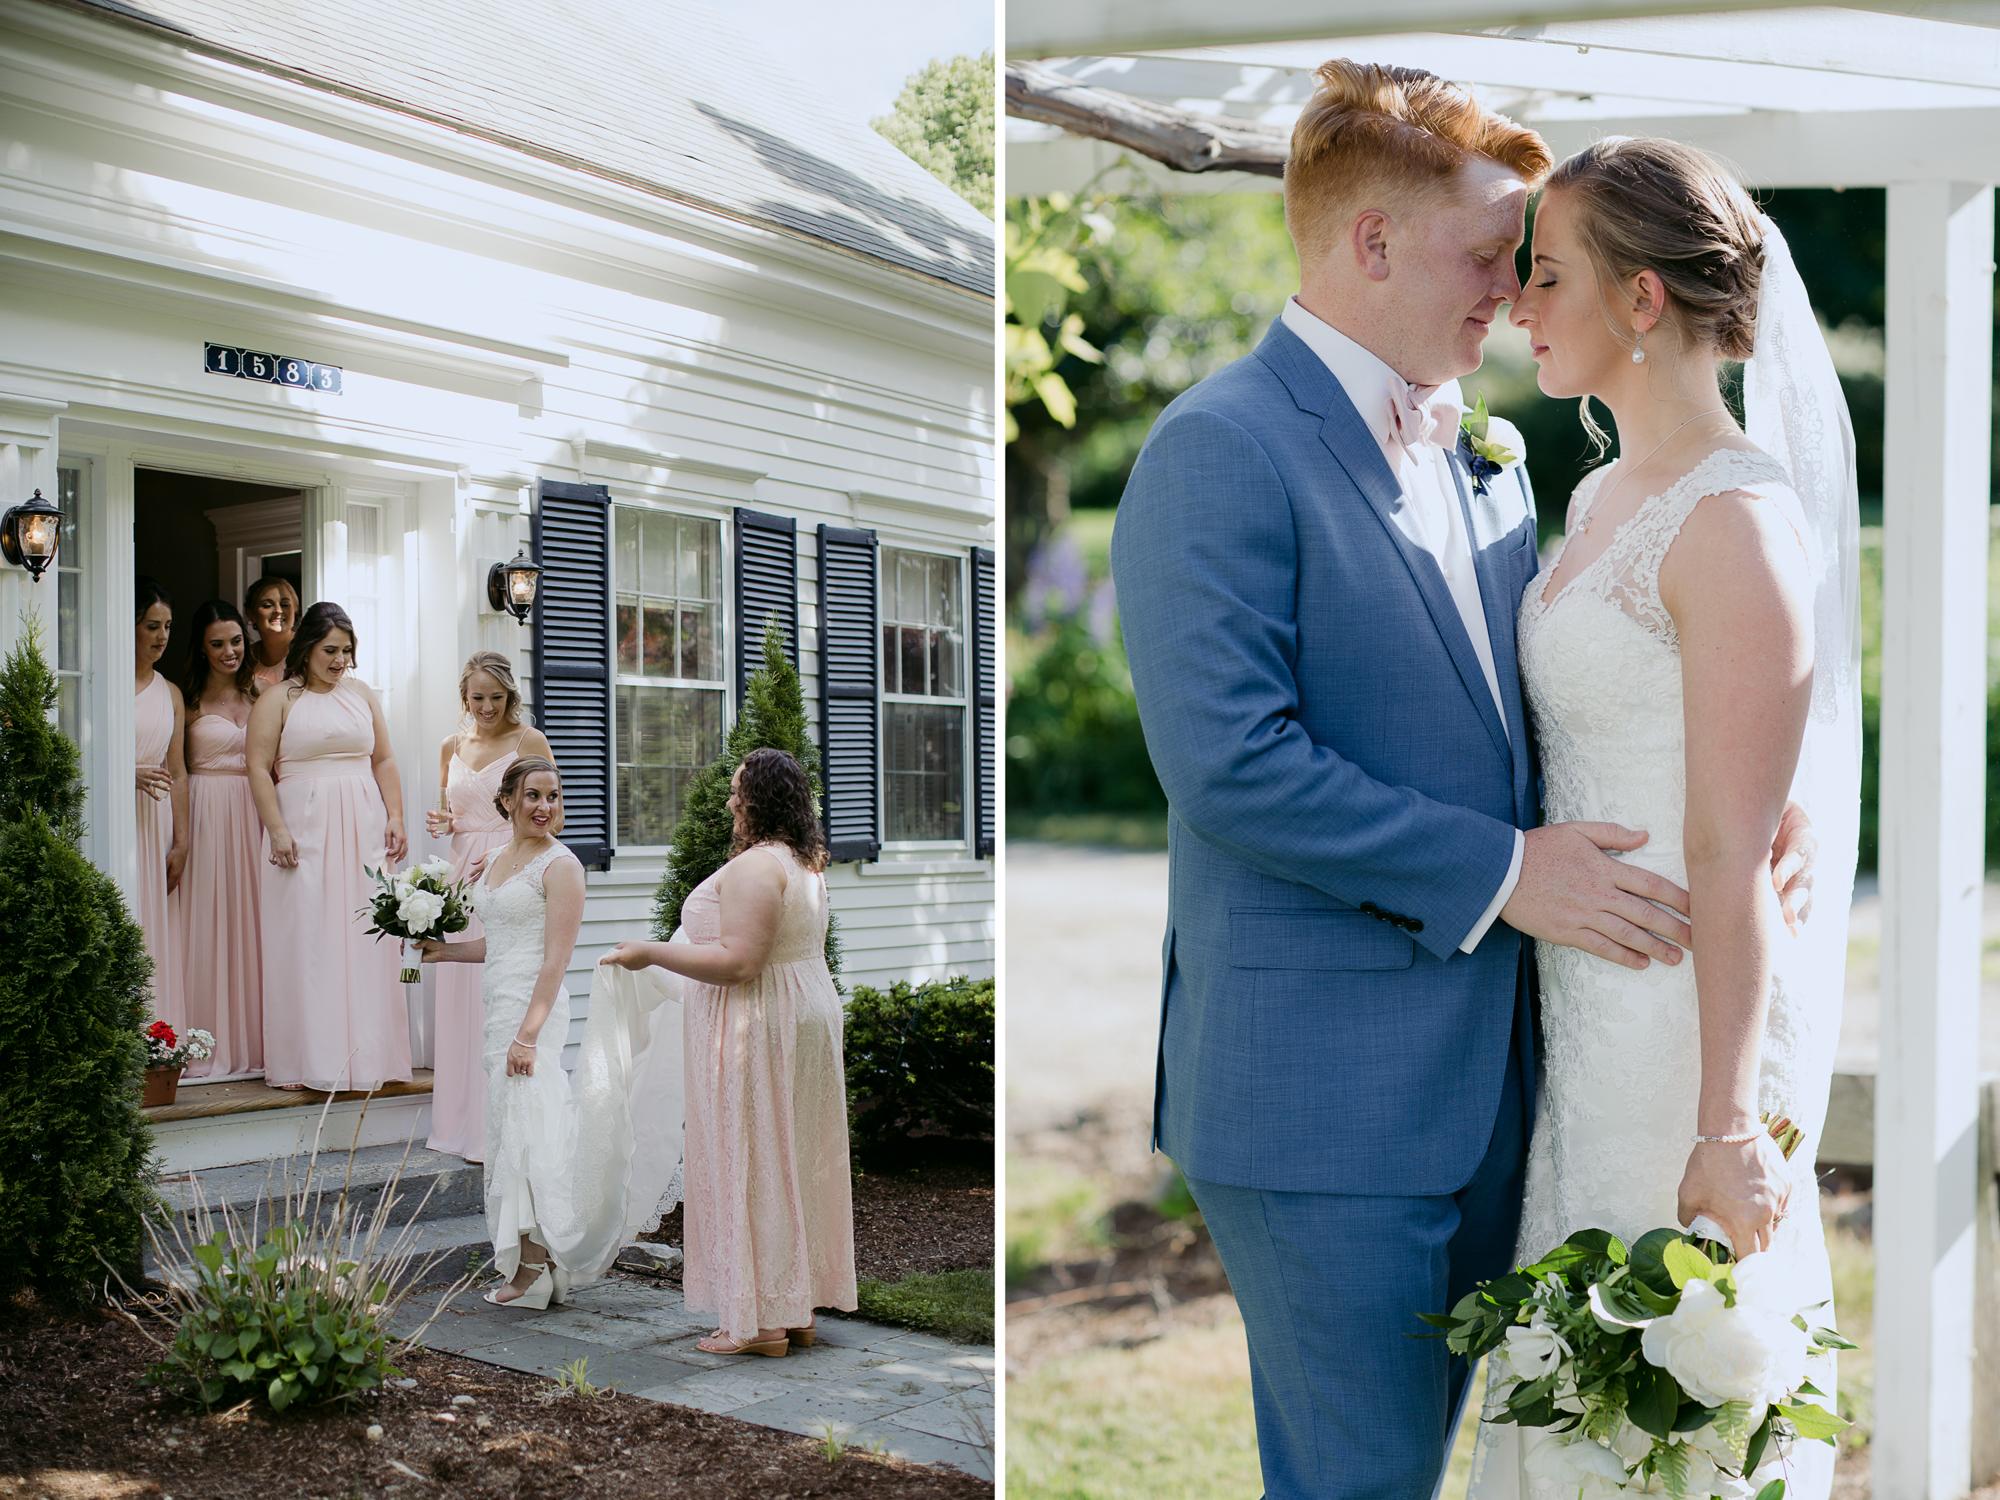 Livewell_Farm_wedding_Harpswell_maine_Meghan_Jim_016.jpg